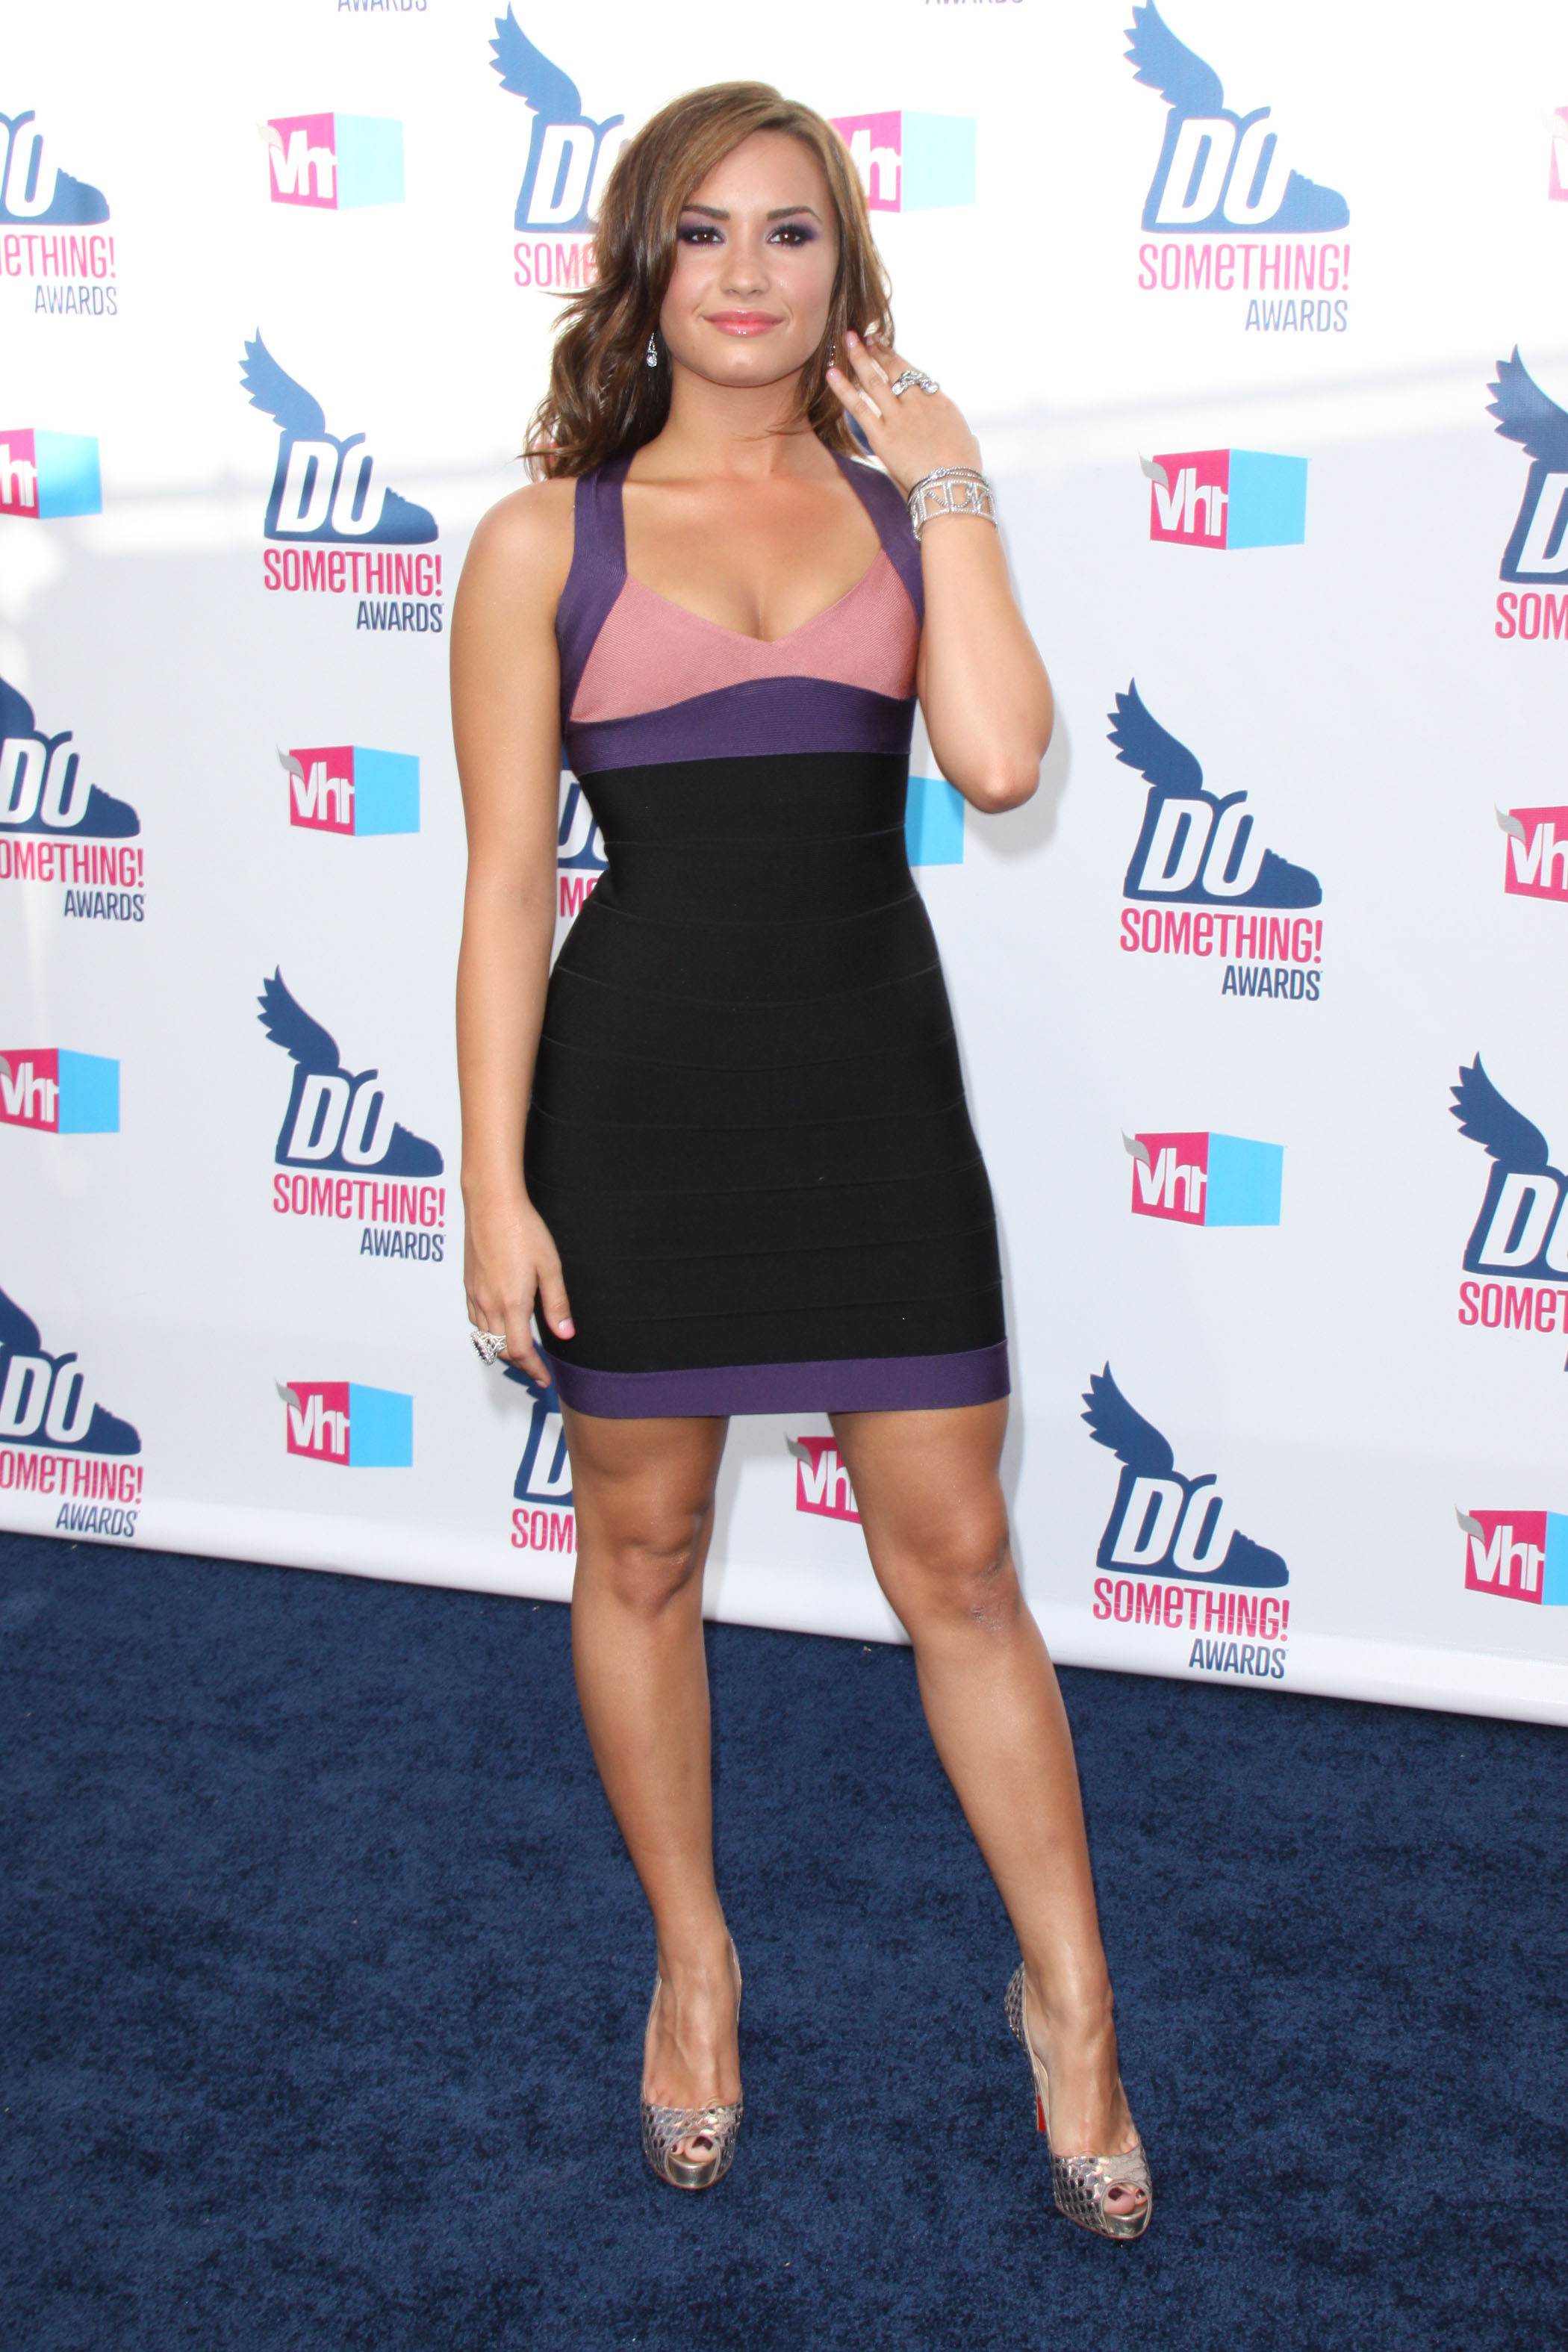 28026_Demi_Lovato_2010_VH1_Do_Something_Awards7_122_487lo.jpg